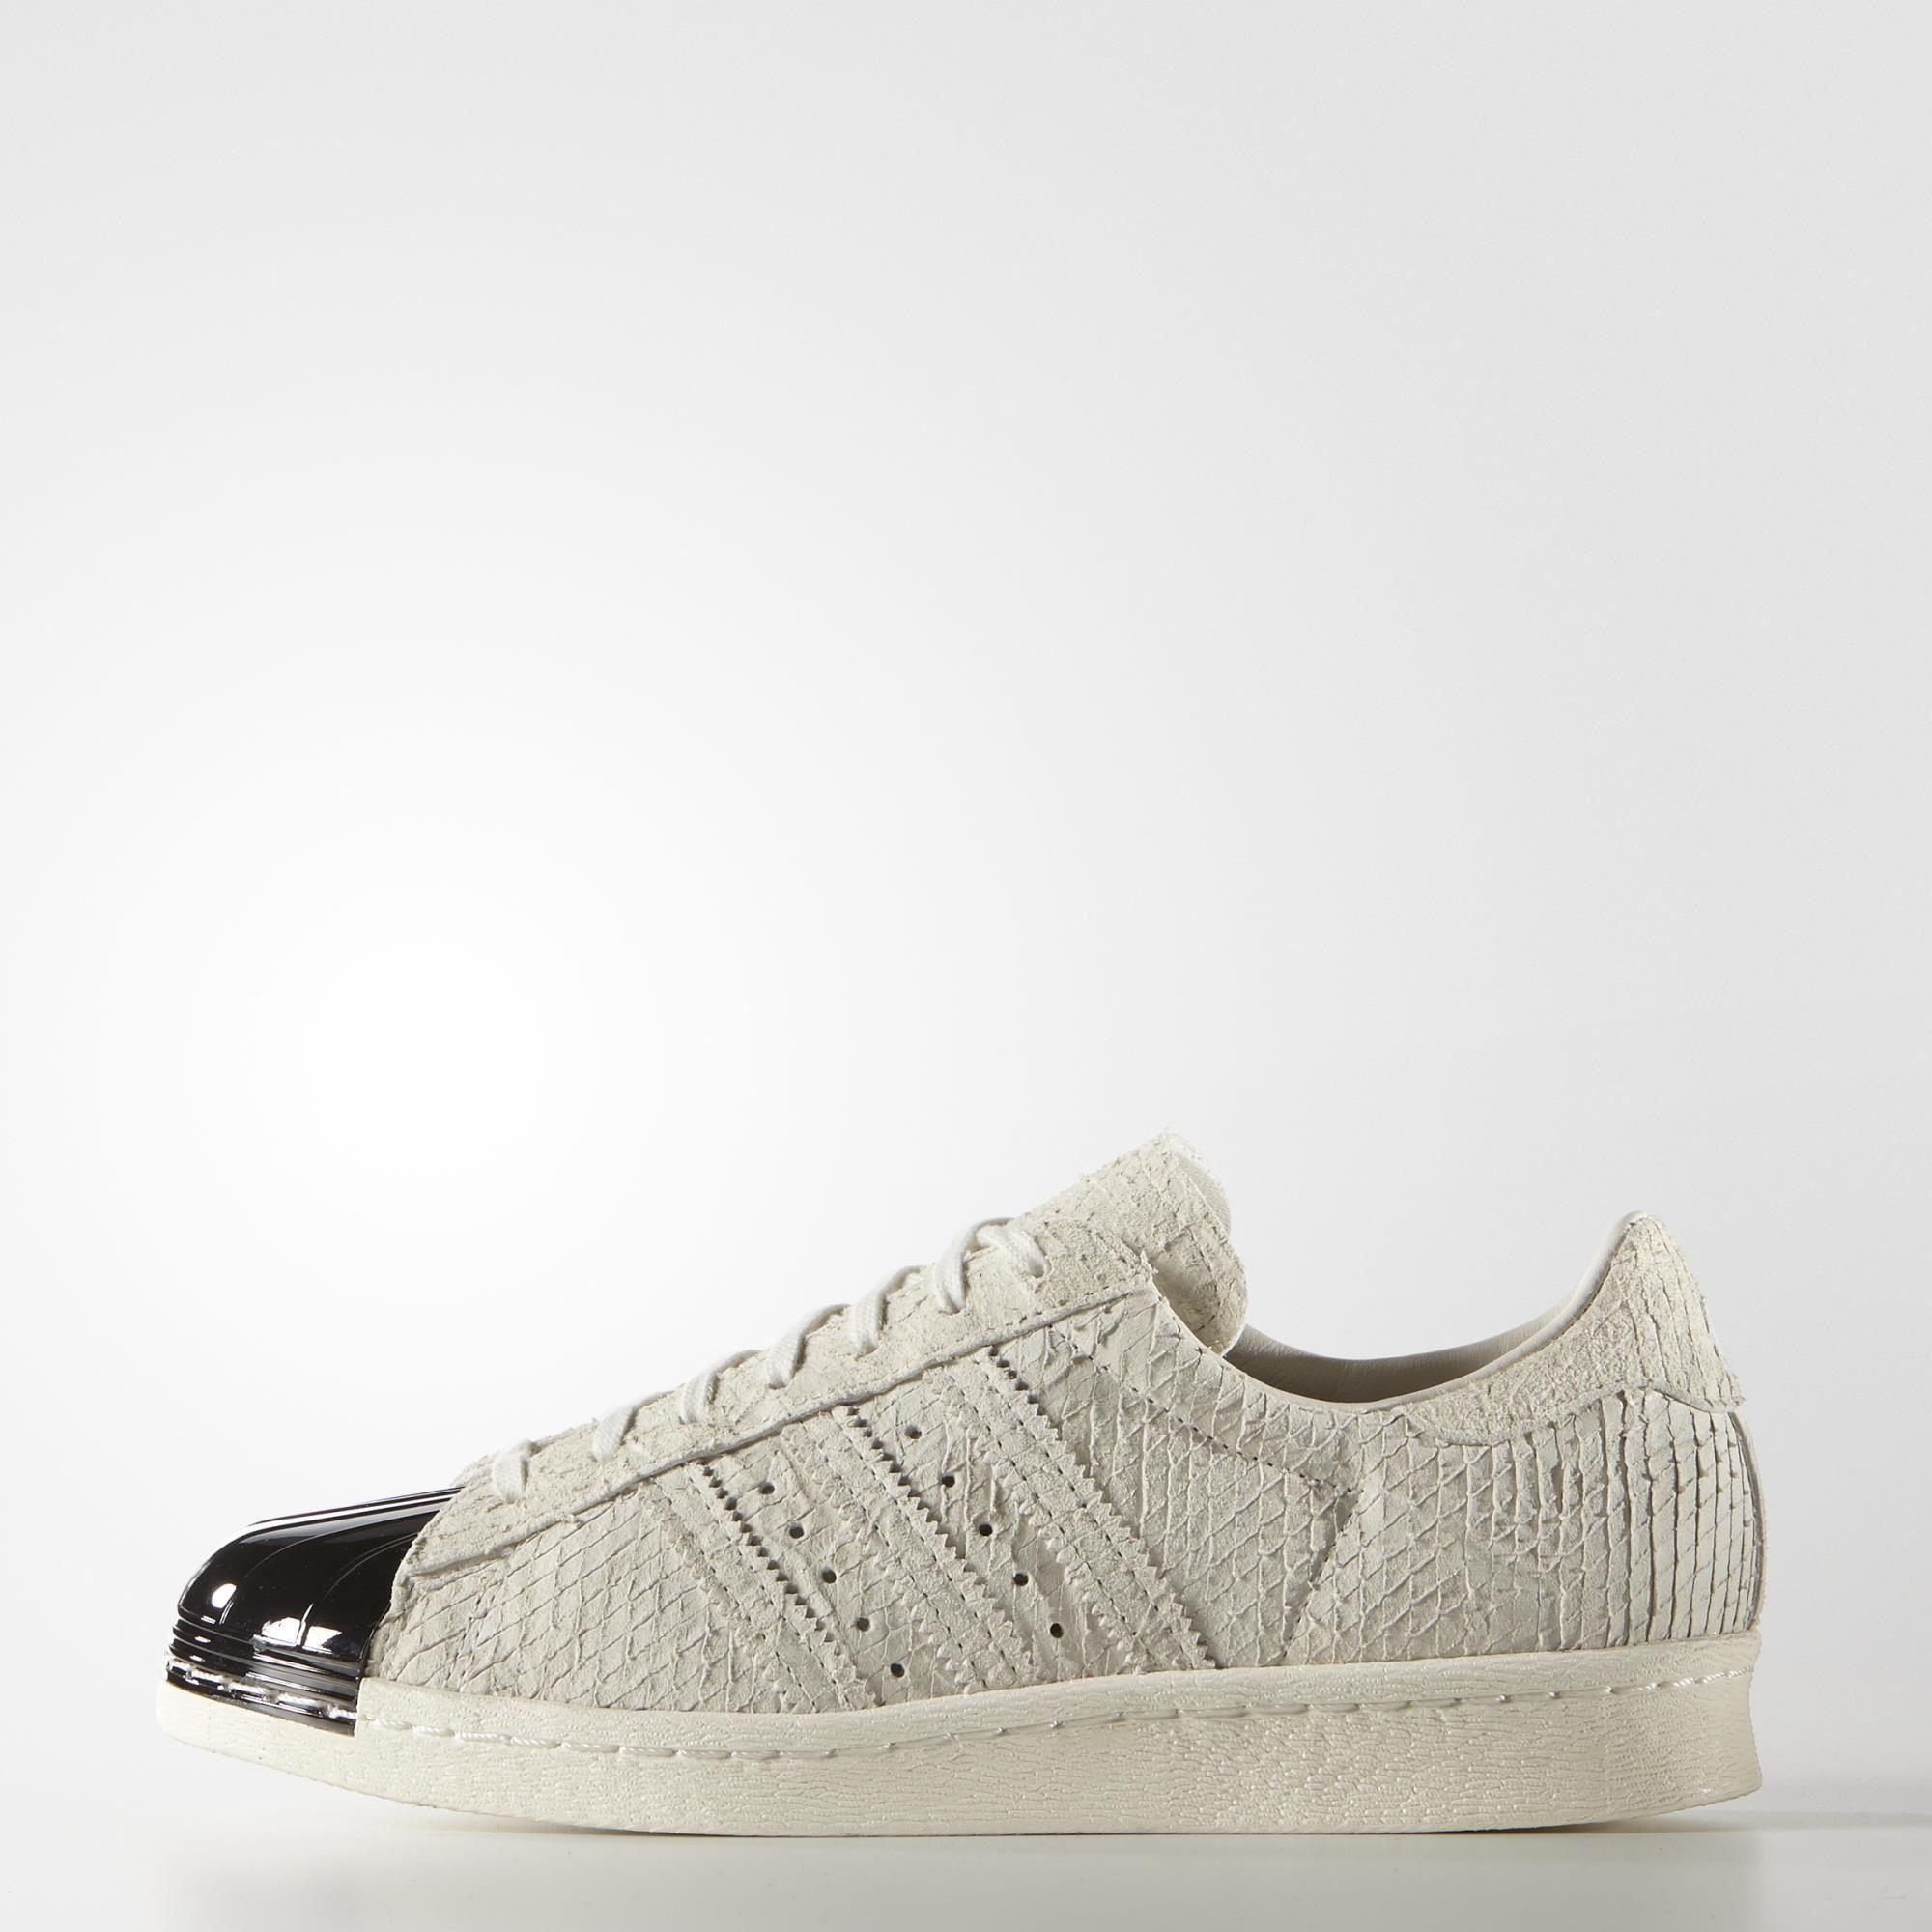 adidas Superstar 80s 80s 80s Metal Toe Zapatos Blanco | adidas US | Mujer 98a42c